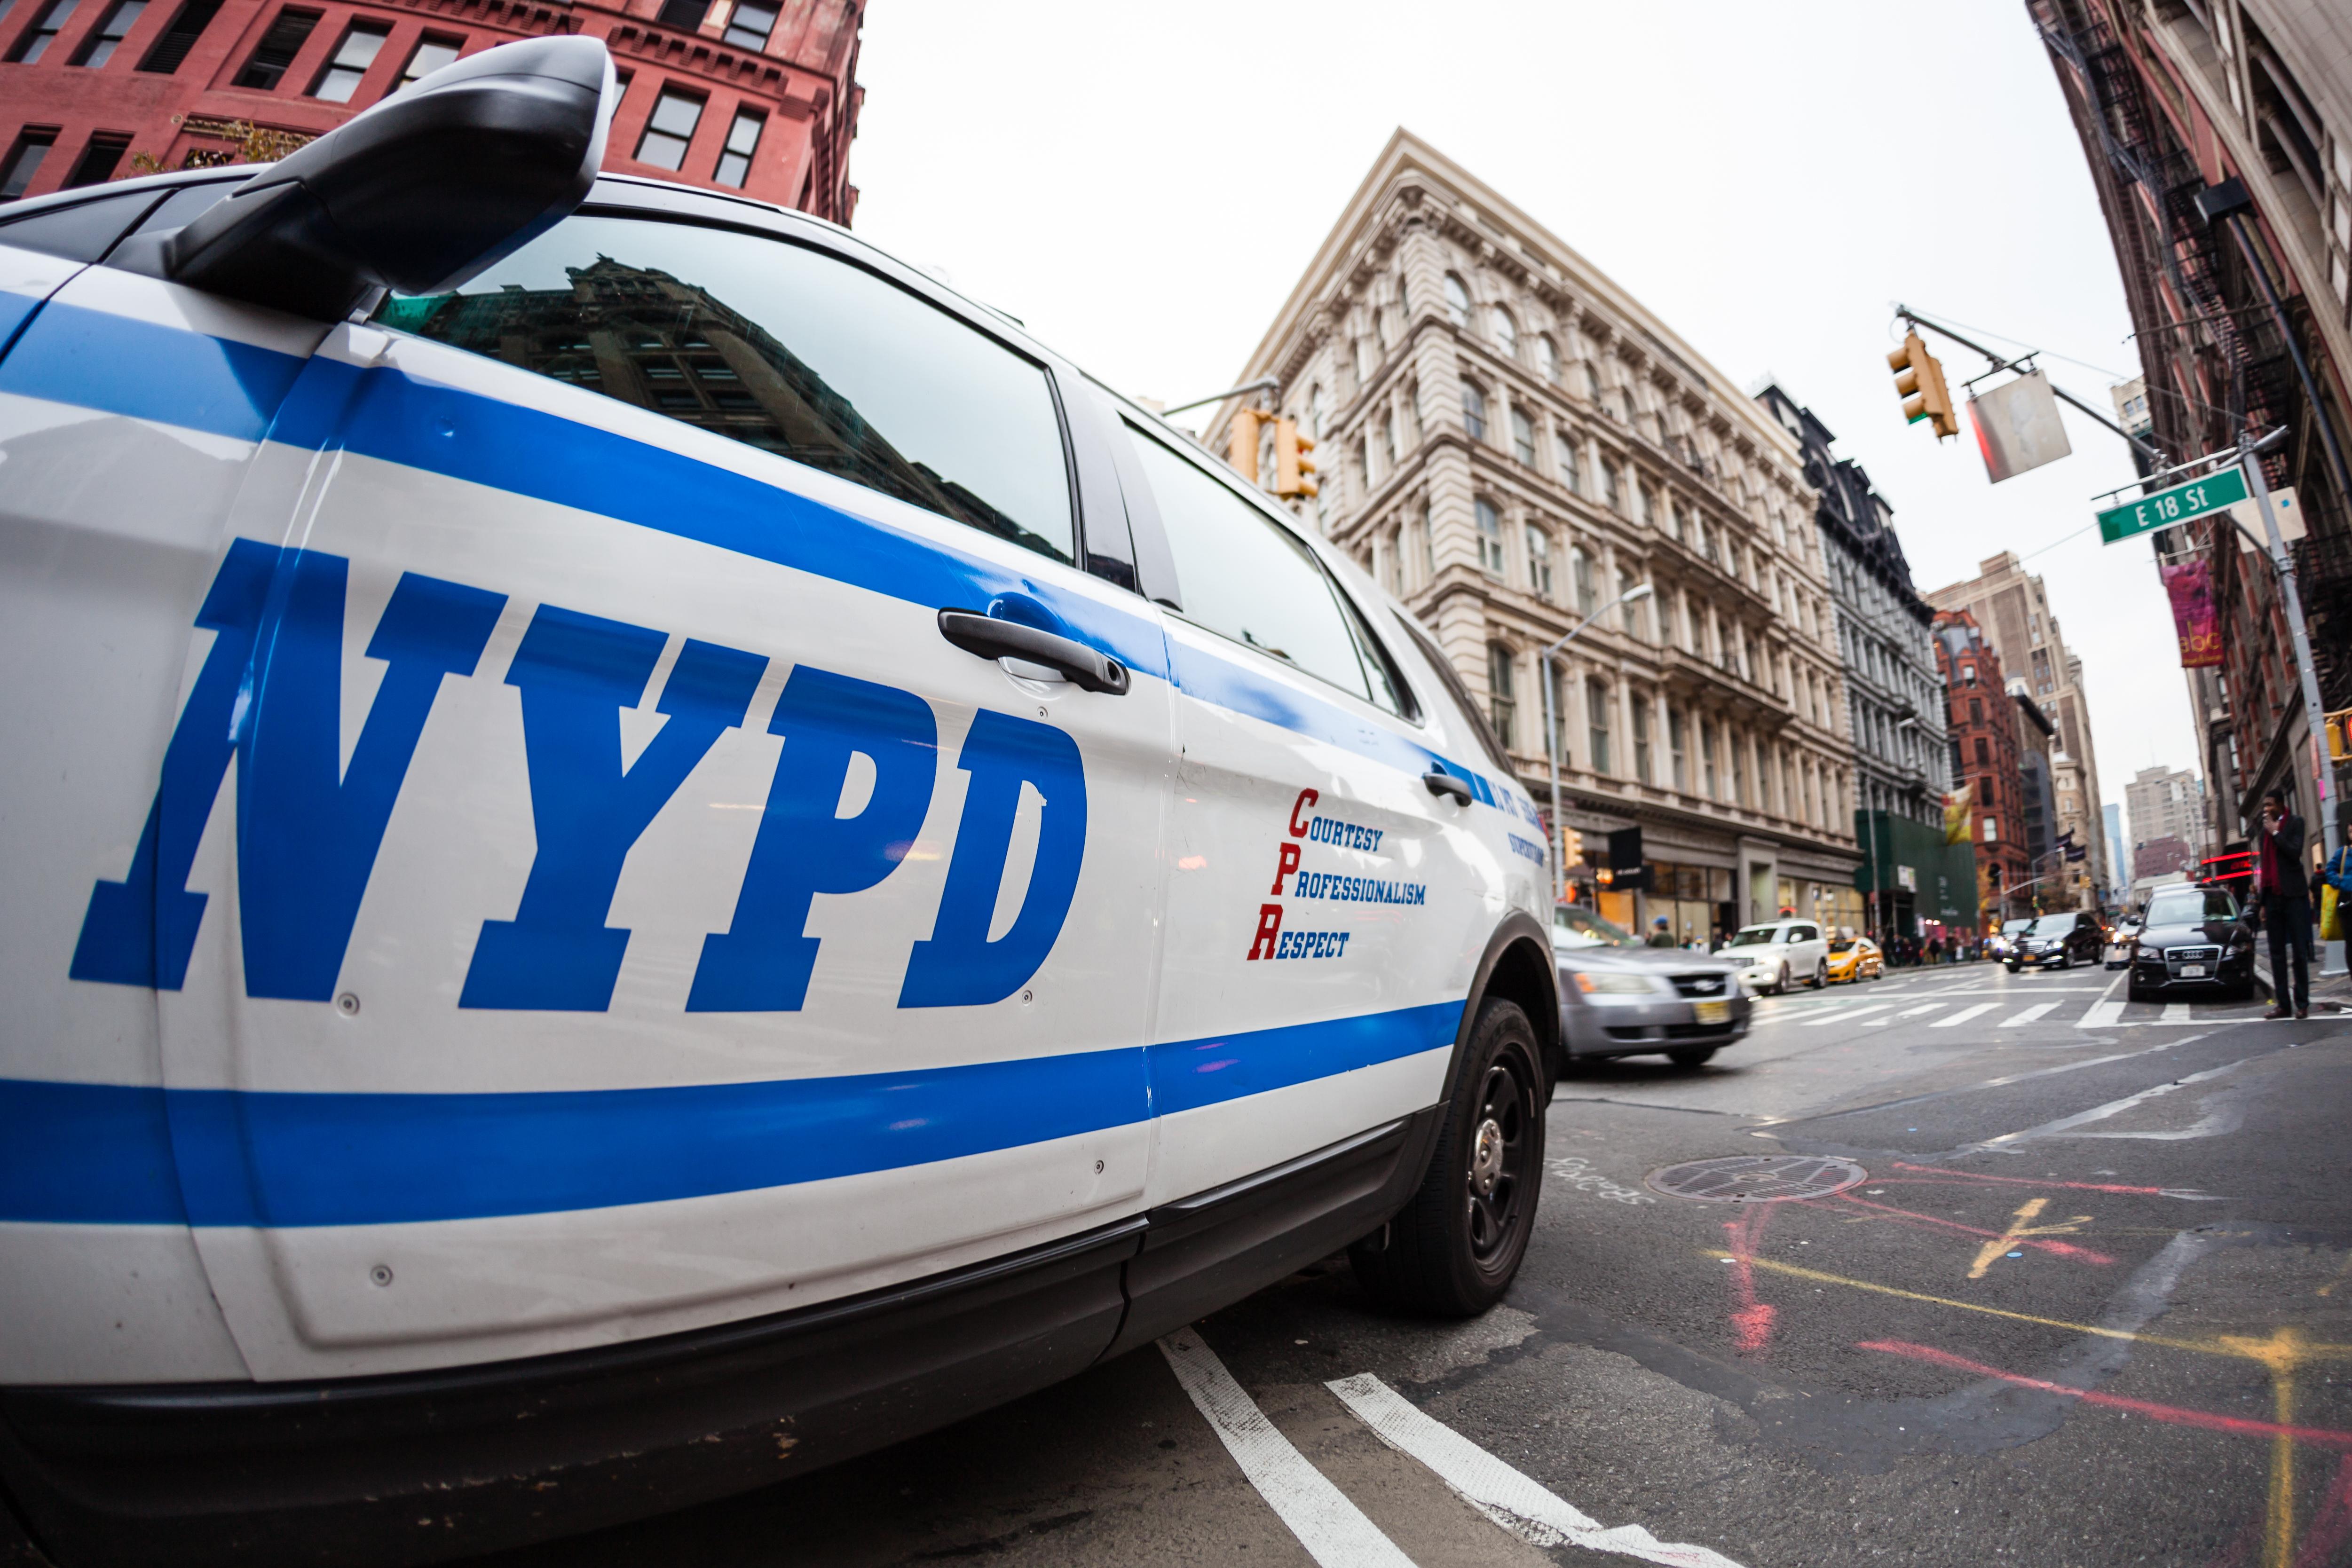 NYPD secretly spent $159 million on surveillance tech